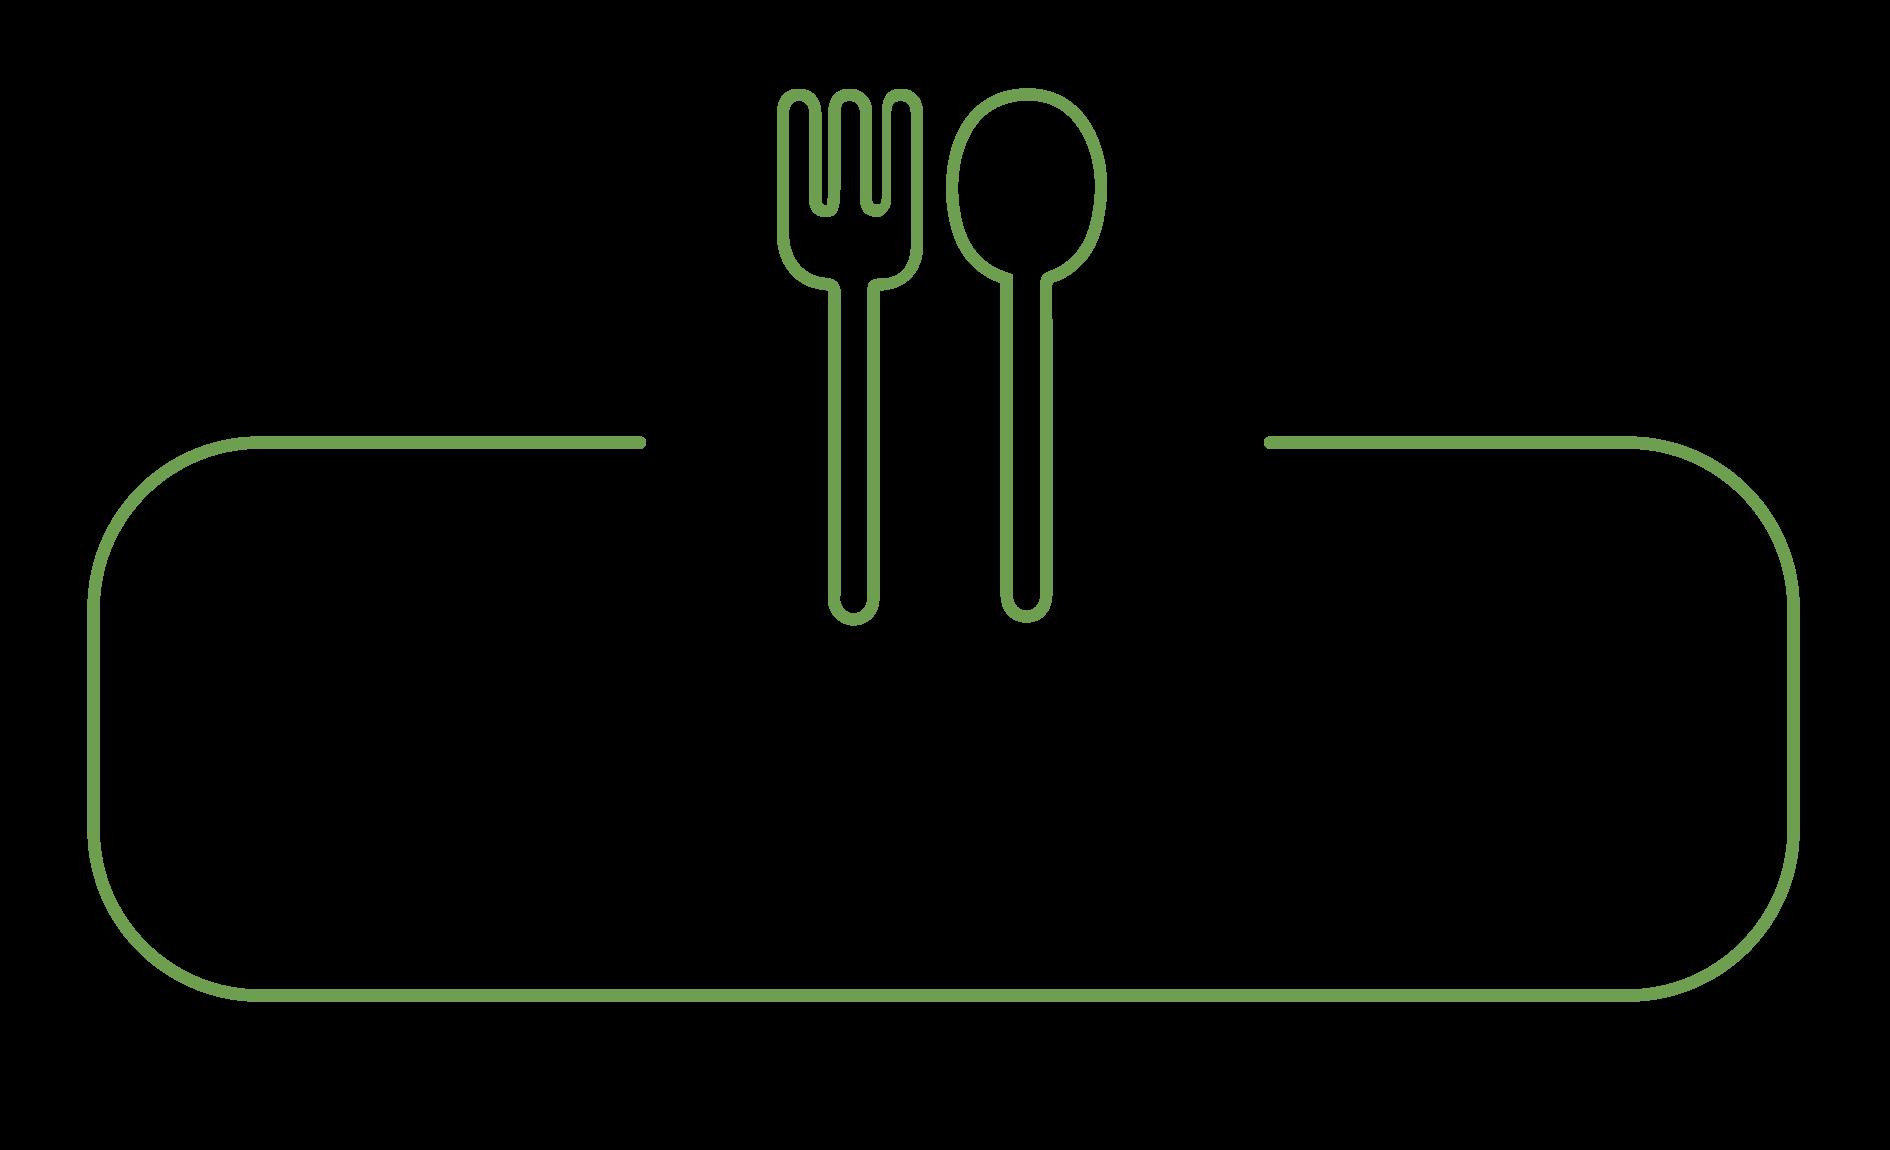 punkt gastronomiczny